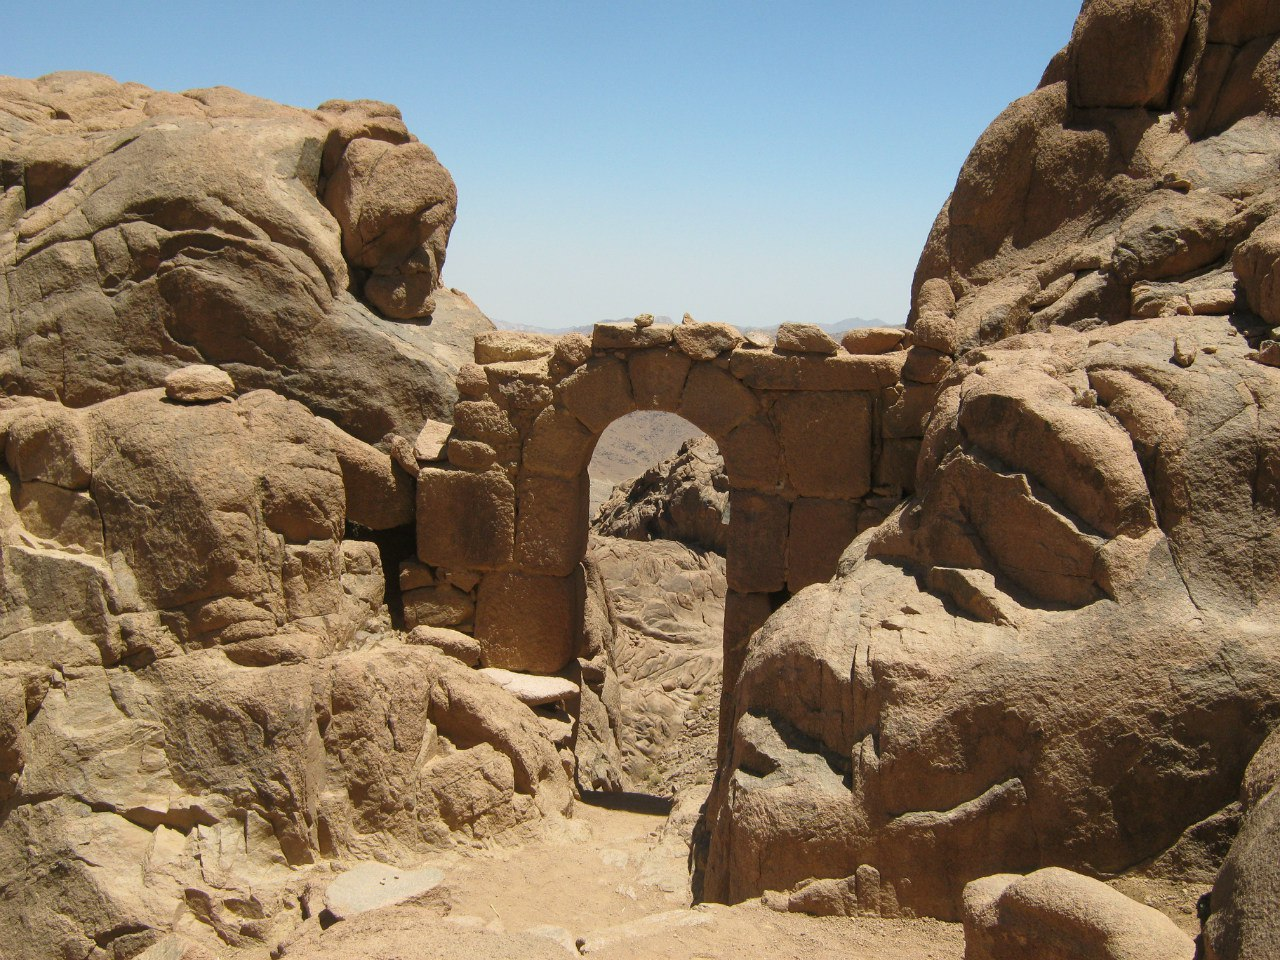 древняя арка на древней тропе на гору Моисея